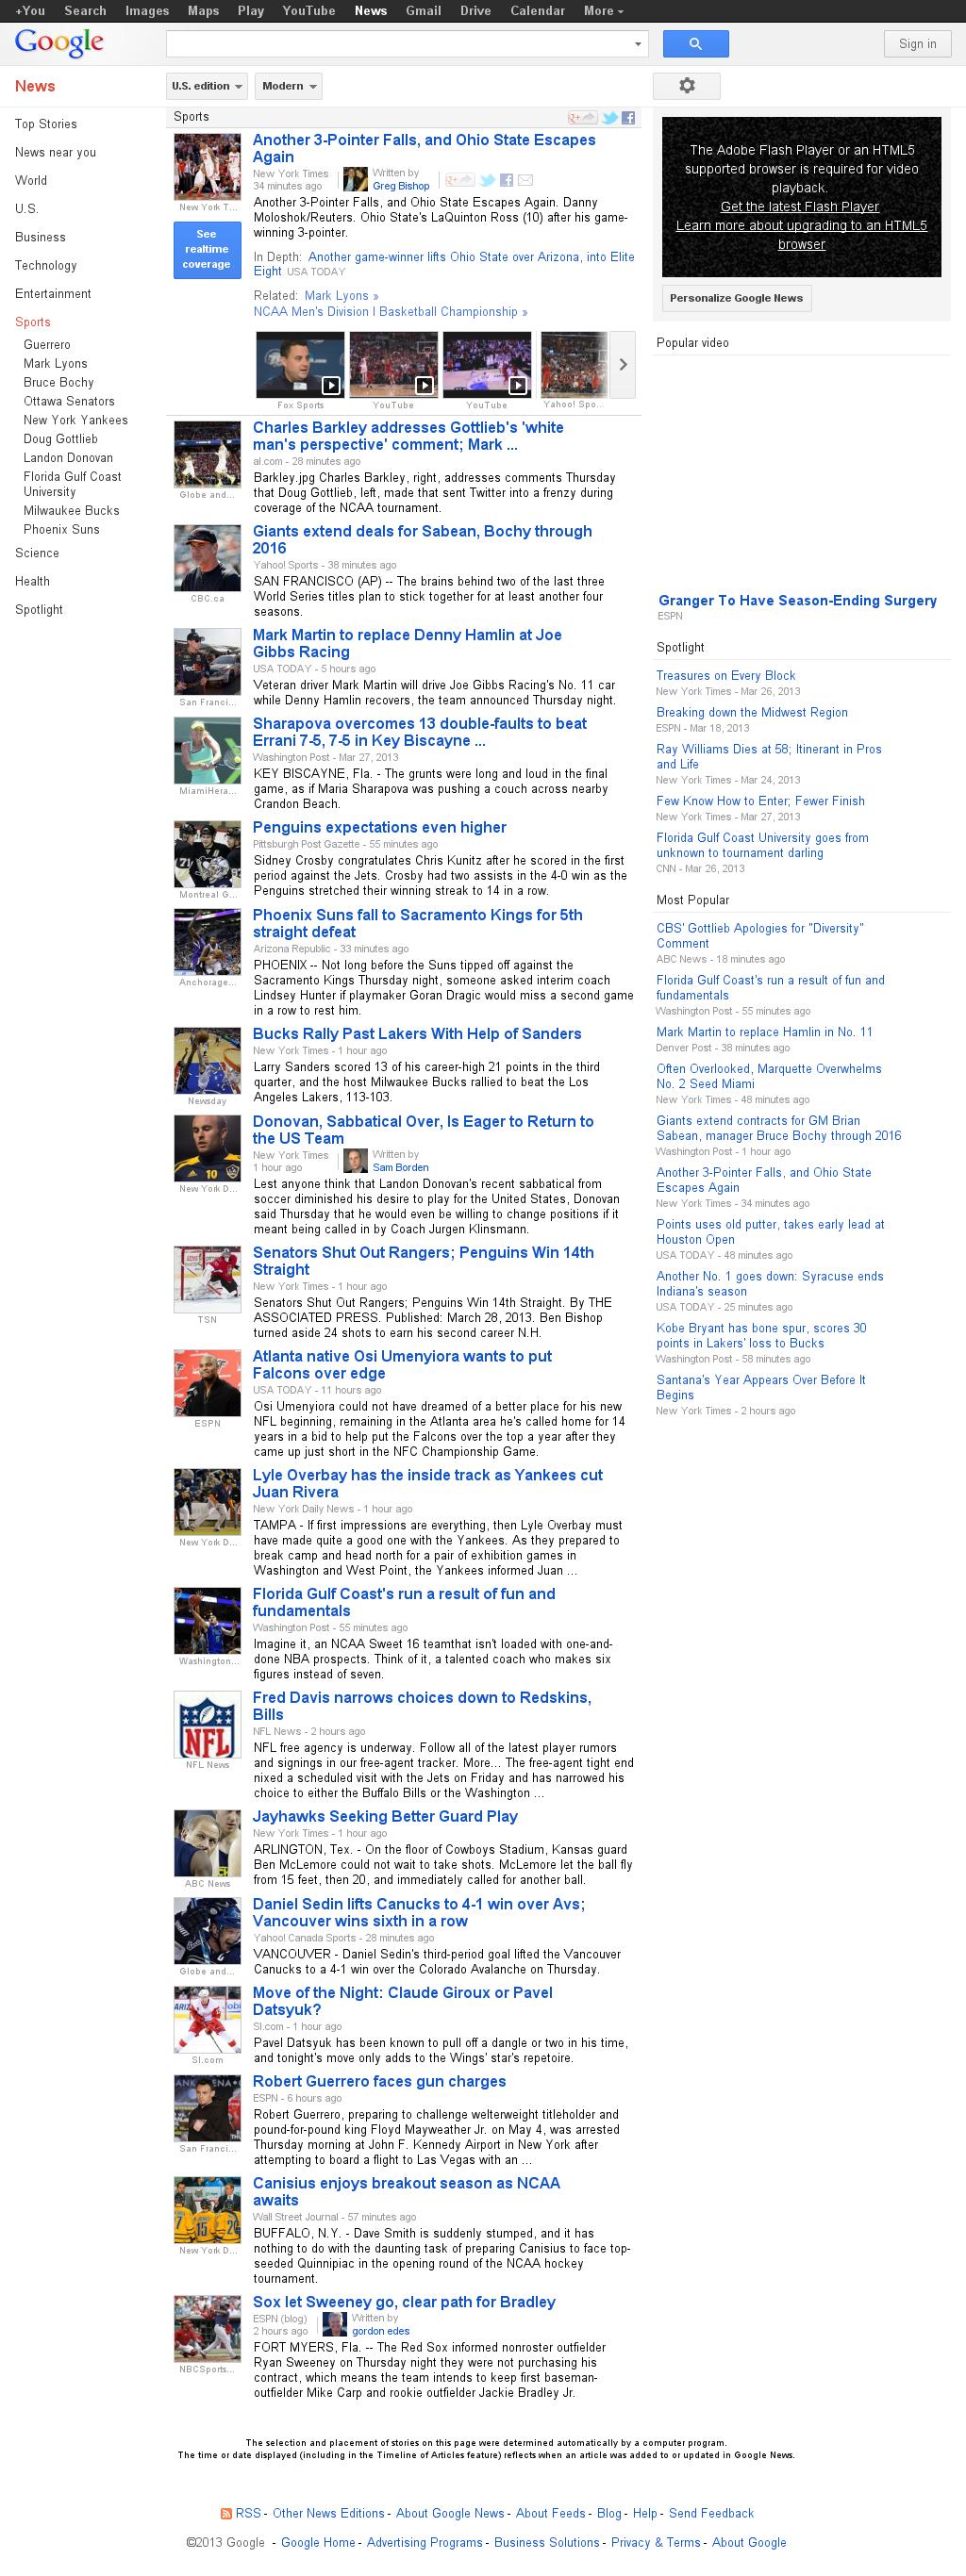 Google News: Sports at Friday March 29, 2013, 5:08 a.m. UTC